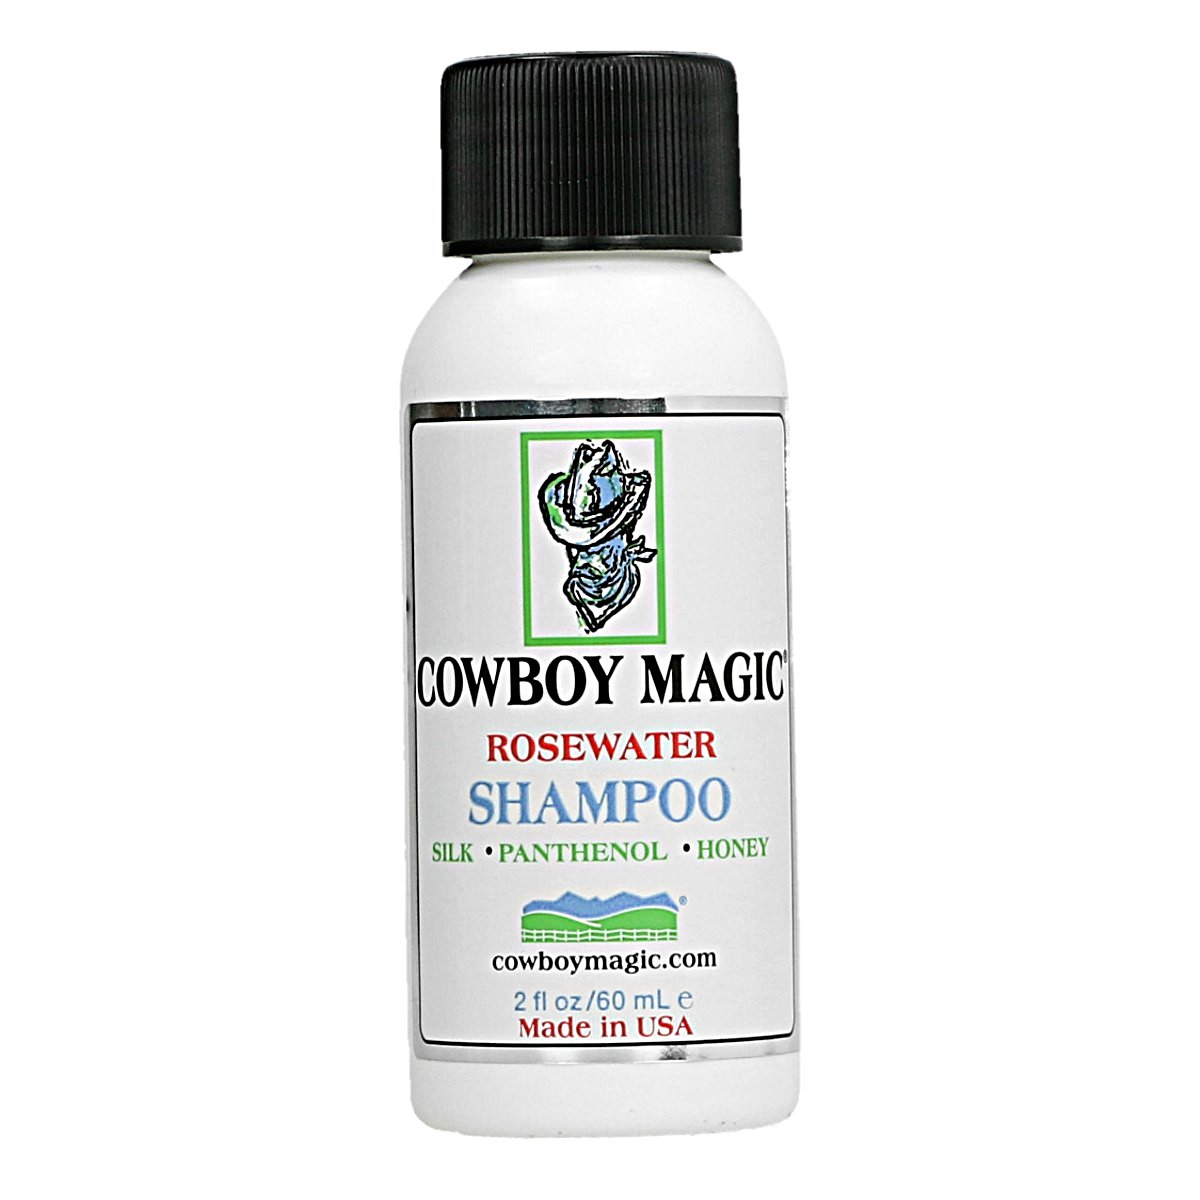 Afbeelding van Cowboy Magic Rosewater Shampoo 60ml